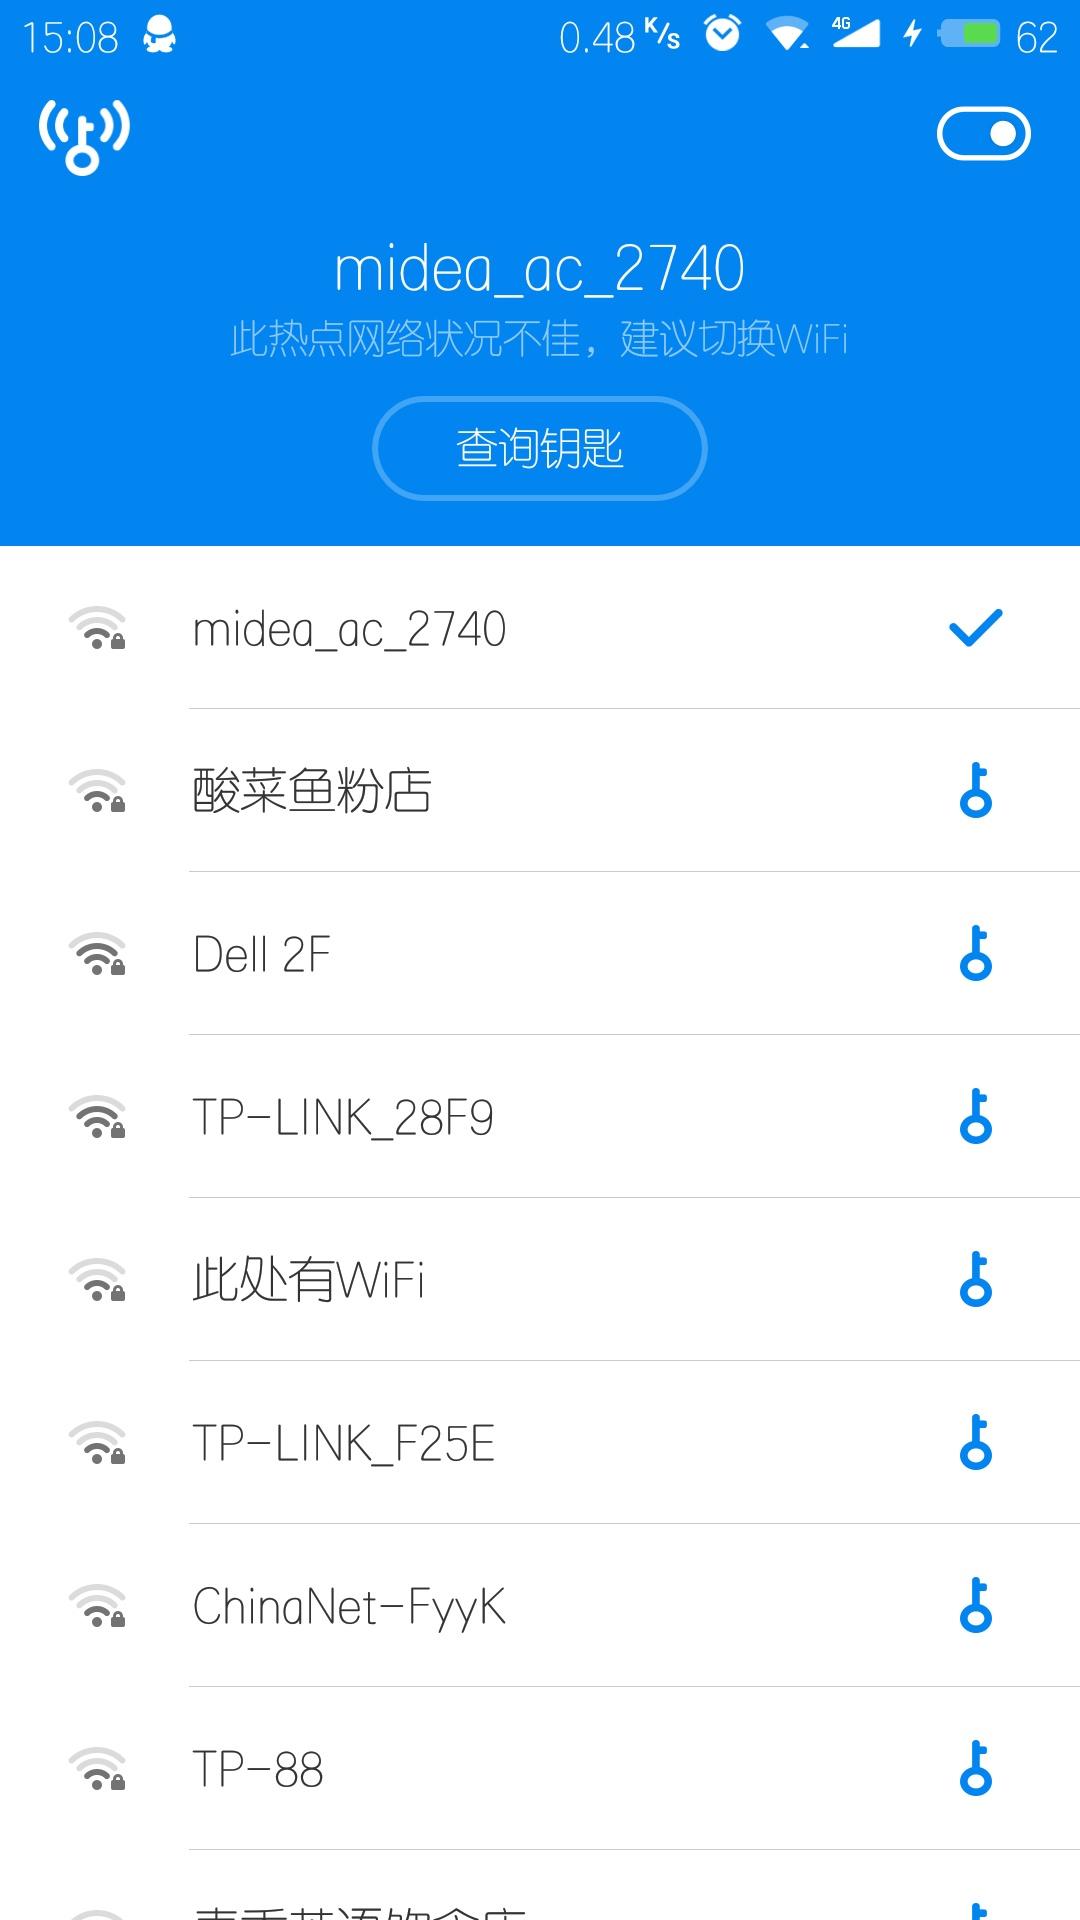 Wifi万能钥匙 v4.3.10 显密码清爽版 By:清羽 支持安卓10,华为手机